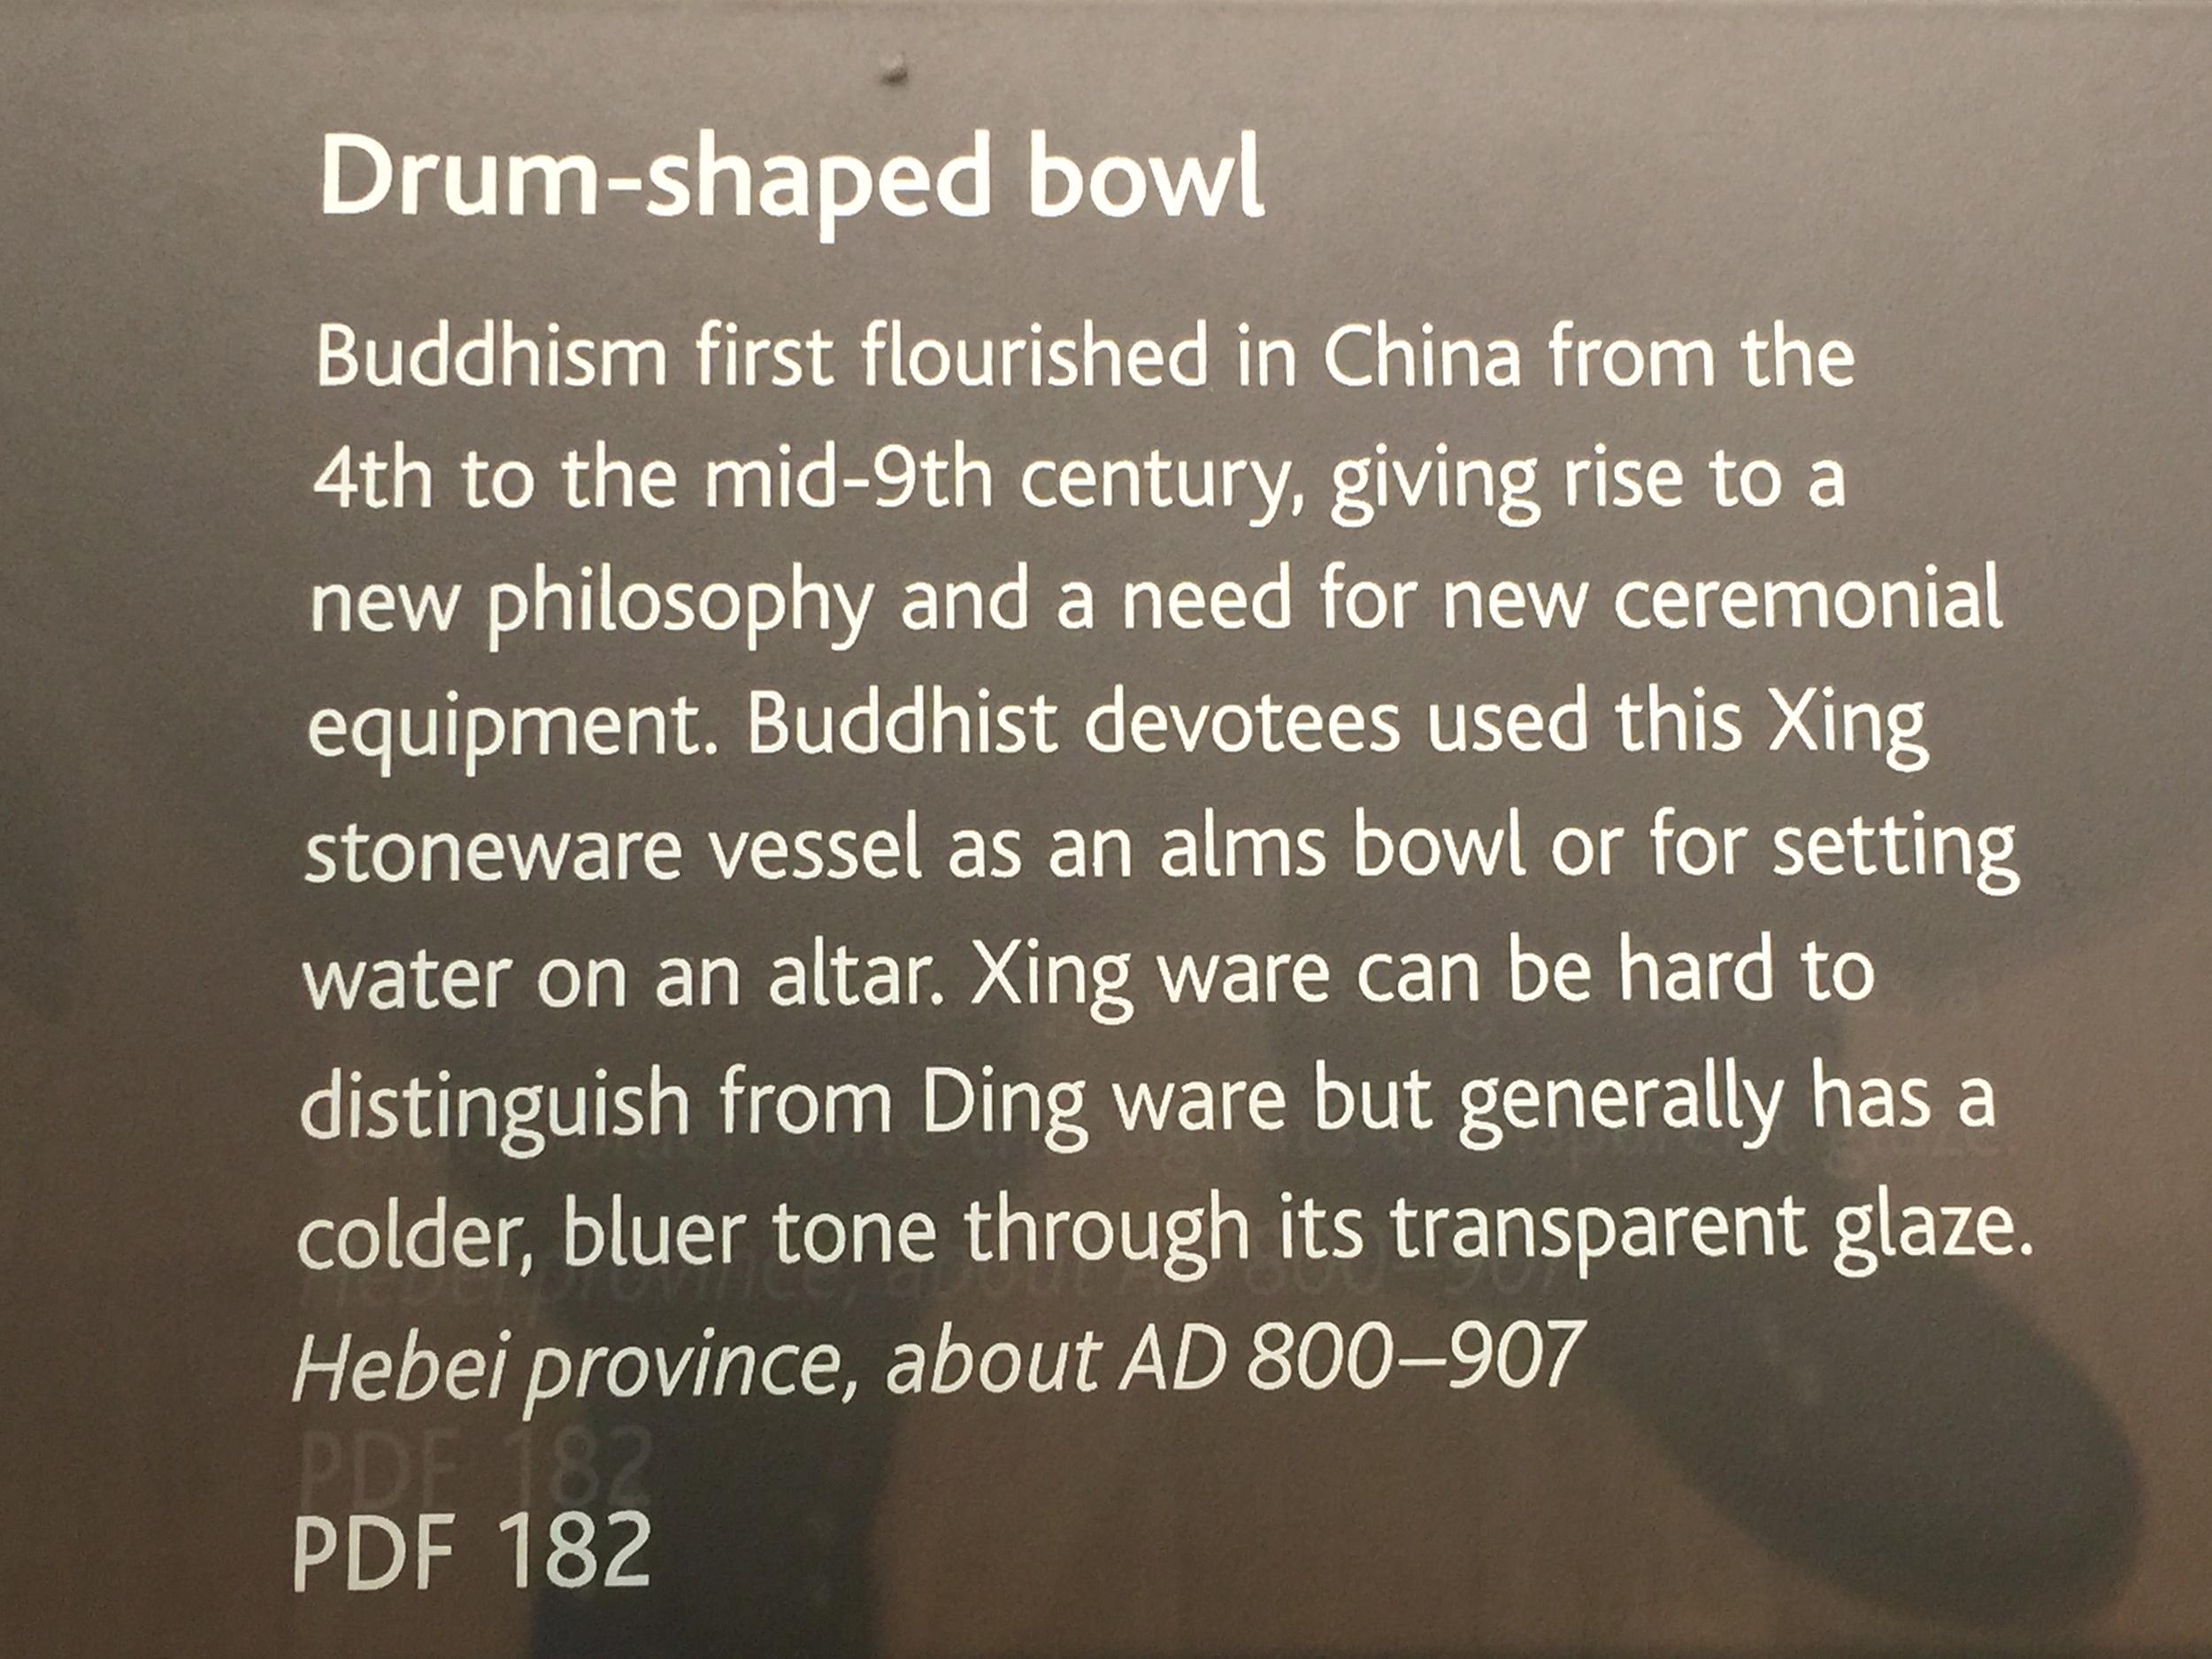 Chinese-Porcelain-British-Museum-Percival-David-jessewaugh.com-3.jpg